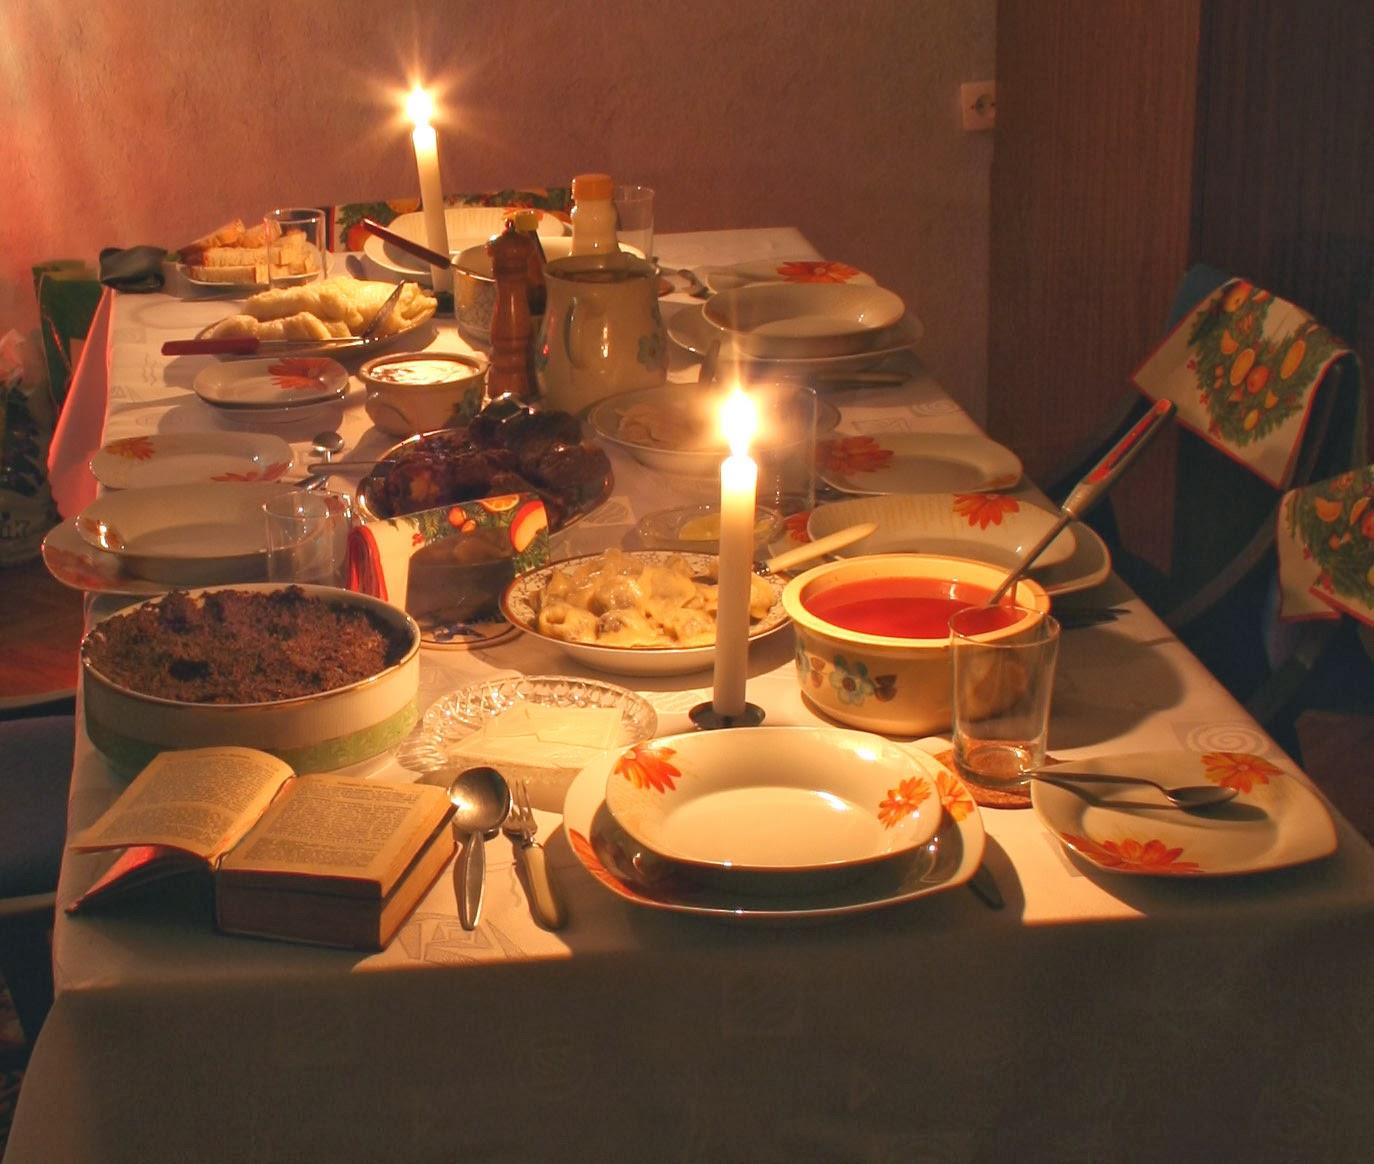 Lent Christian Holiday